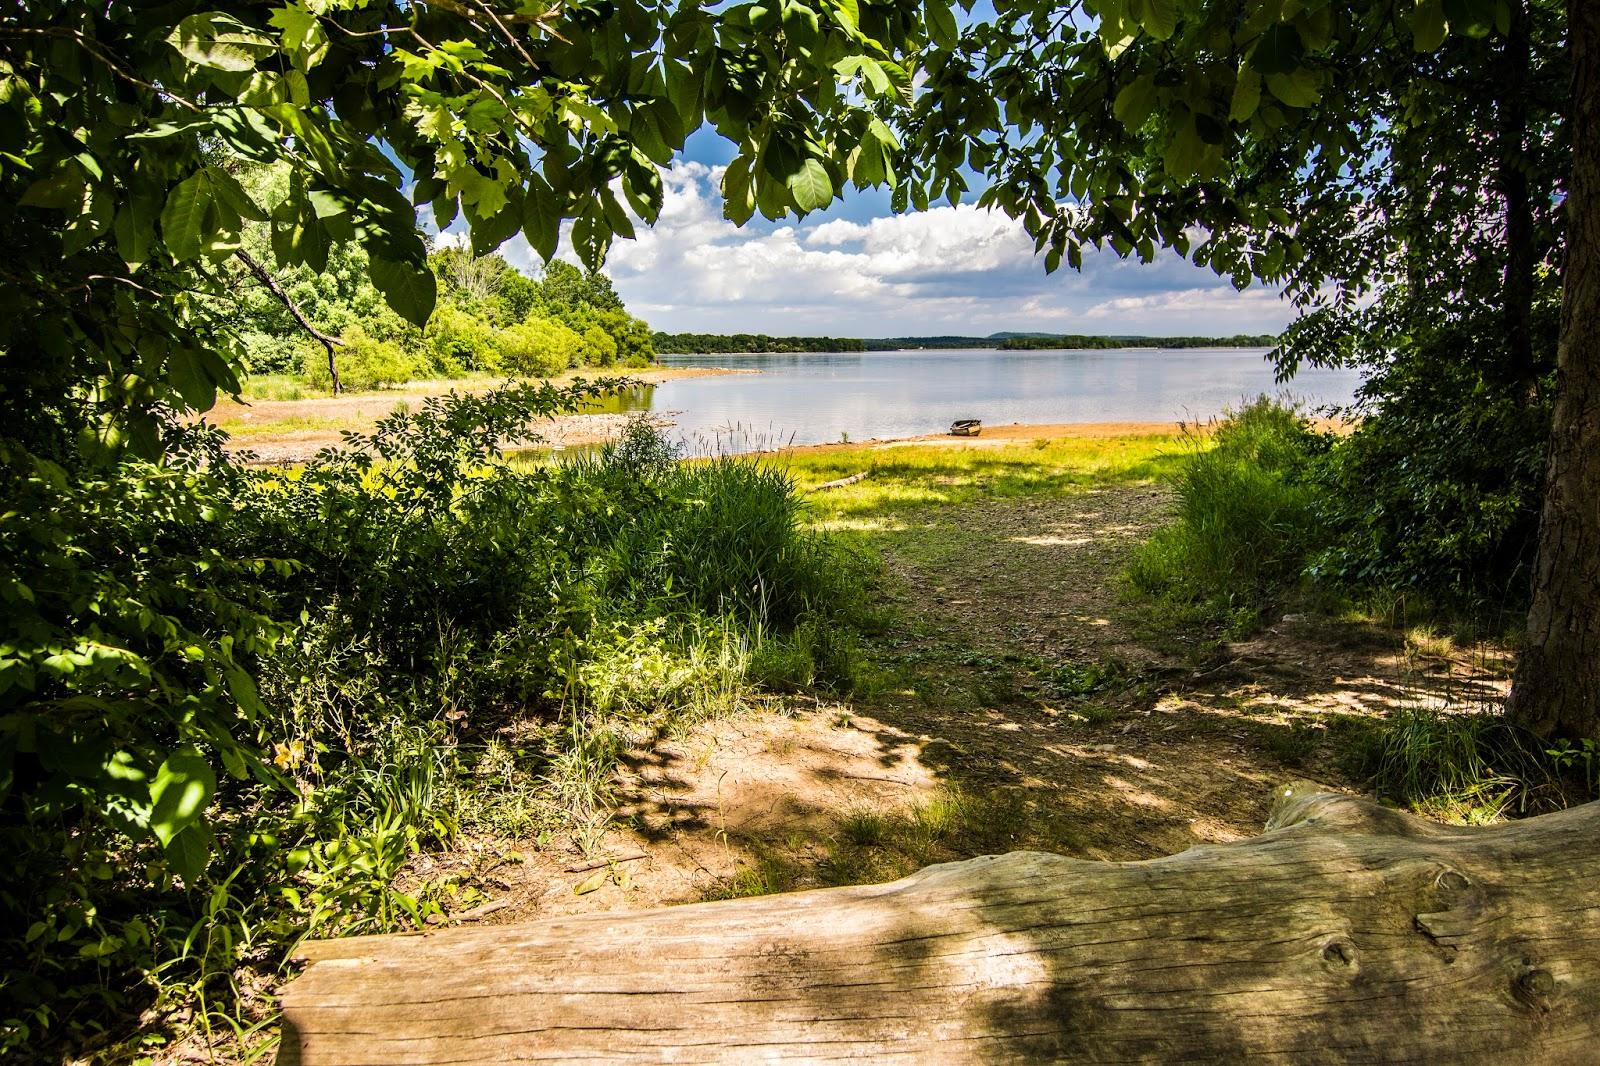 Litton's Fishing Lines: 5-Pound Bass Squareback Canoe Maiden Voyage